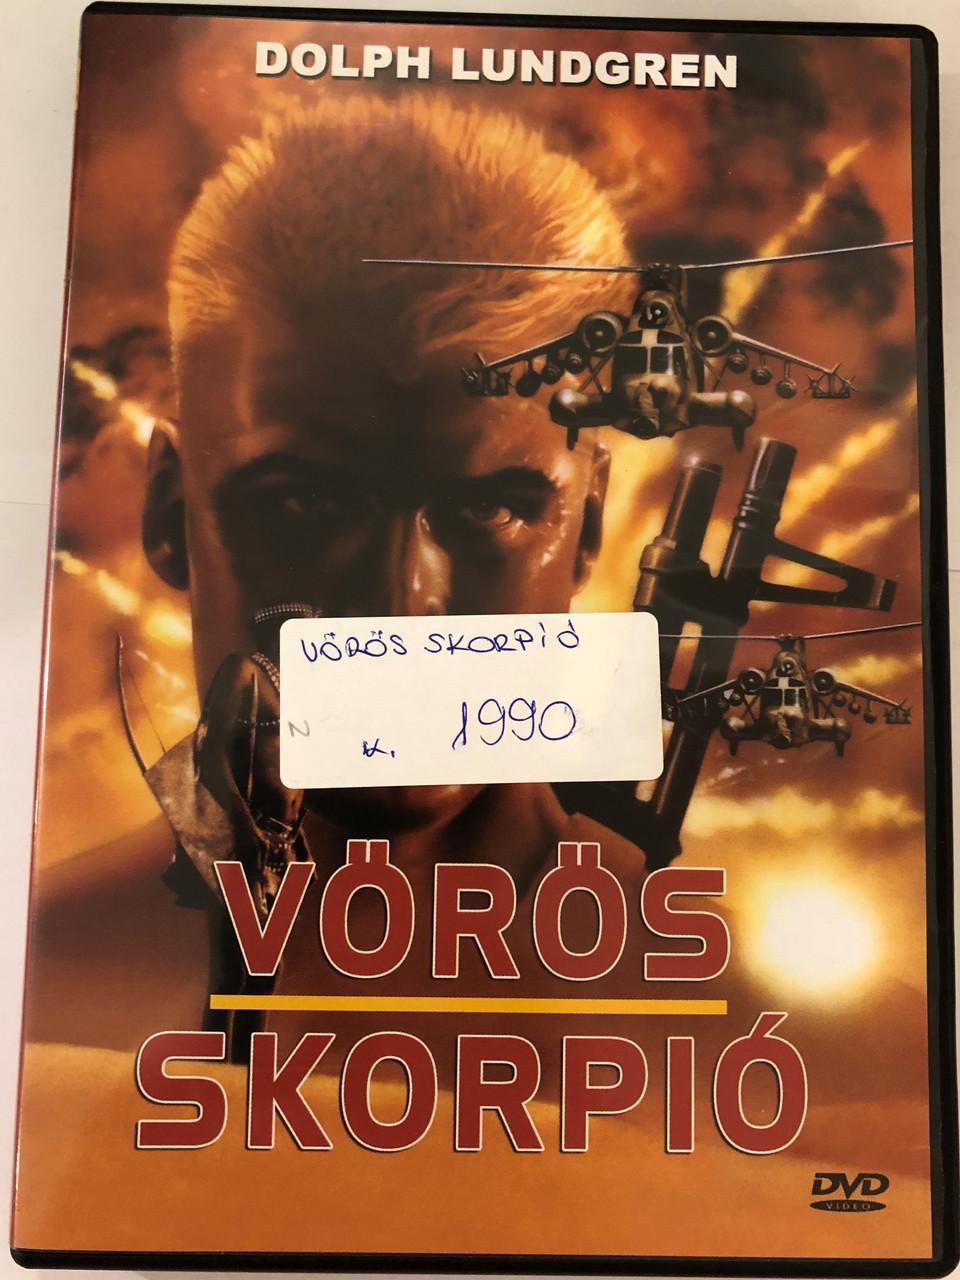 Red Scorpion (1988) Dolph Lundgren, M. Emmet Walsh, Al